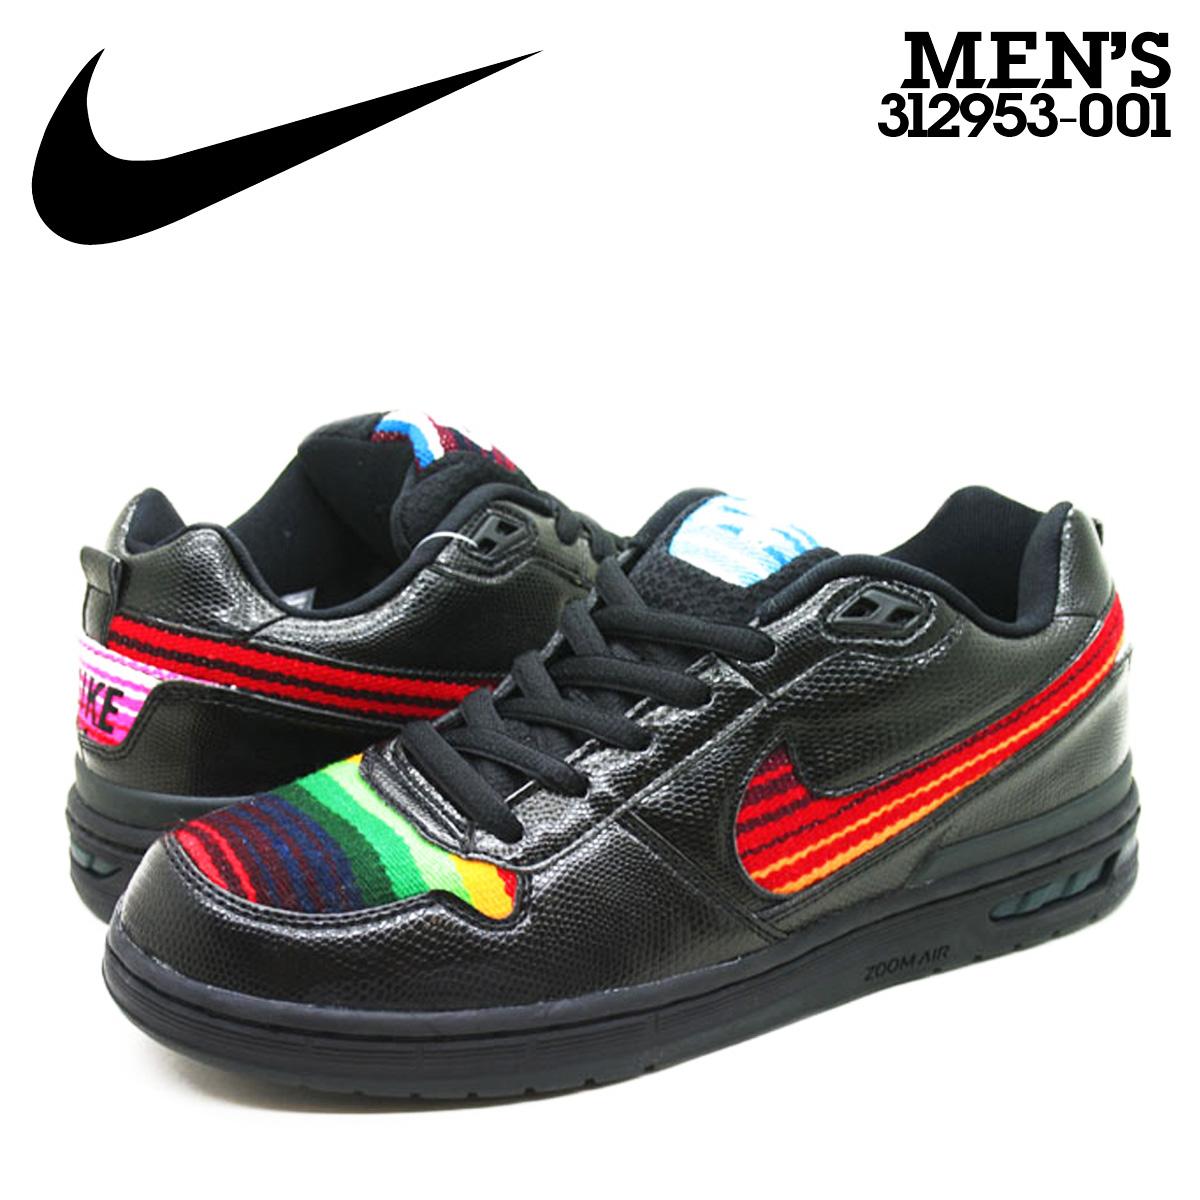 1ca37a508d99 Whats up Sports  NIKE Nike zoom air elite sneaker PAUL RODRIGUEZ ...